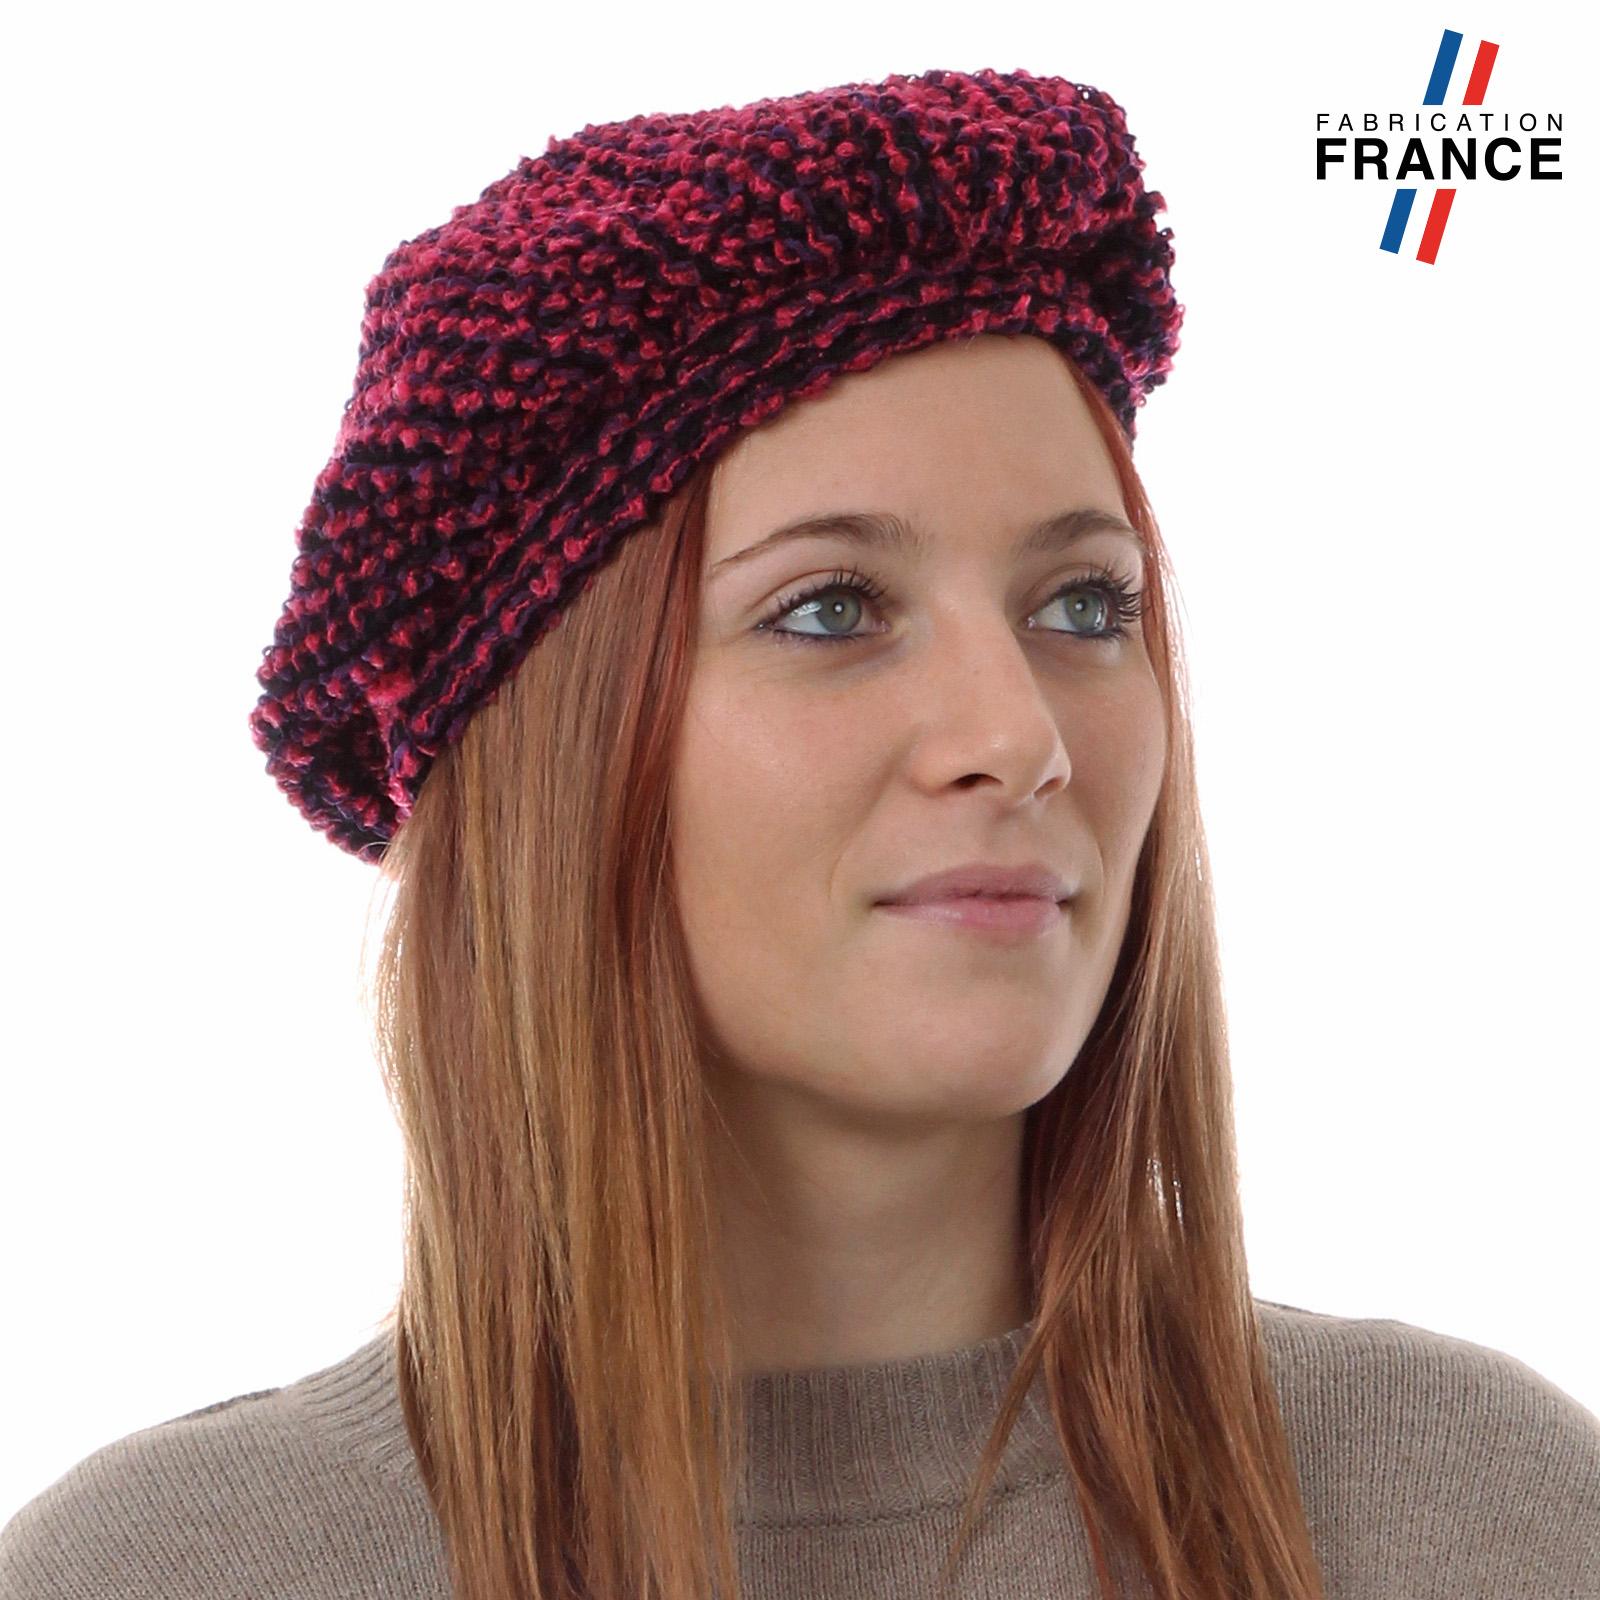 CP-00684-V16-beret-femme-rose-fuchsia-fabrication-francaise